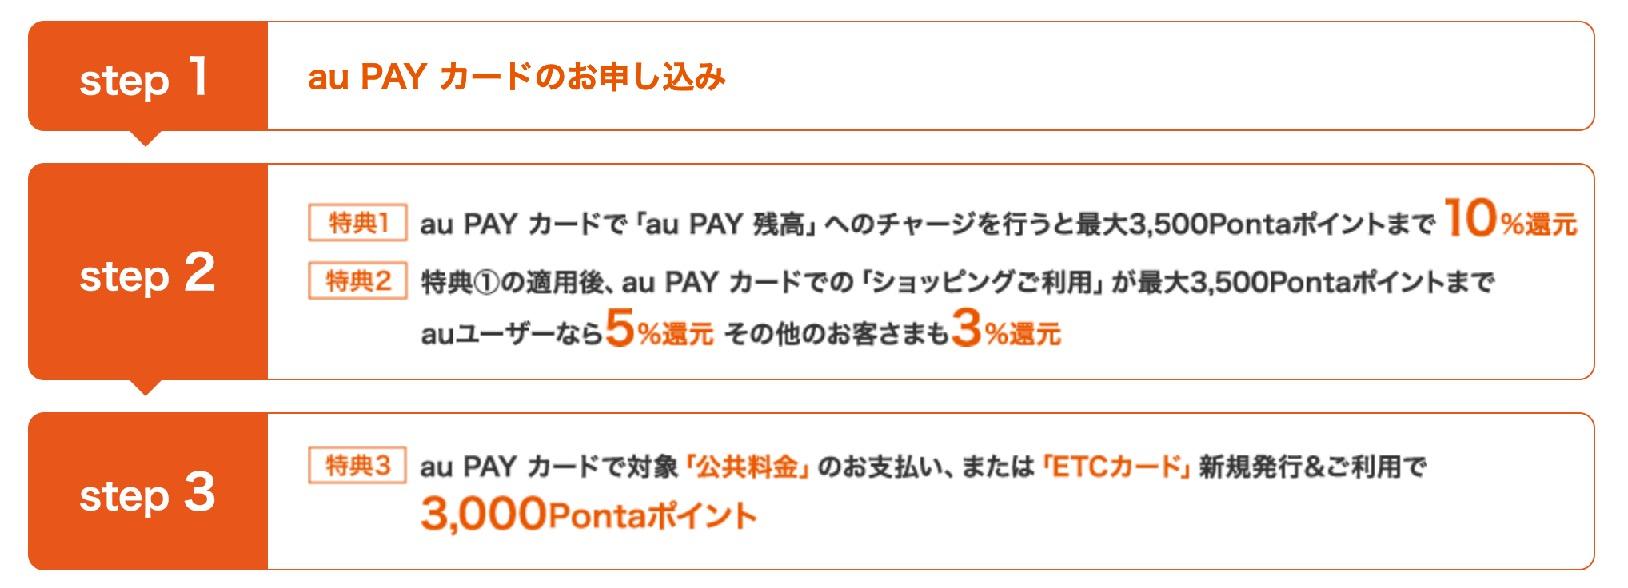 au Payカードの特典獲得のステップ